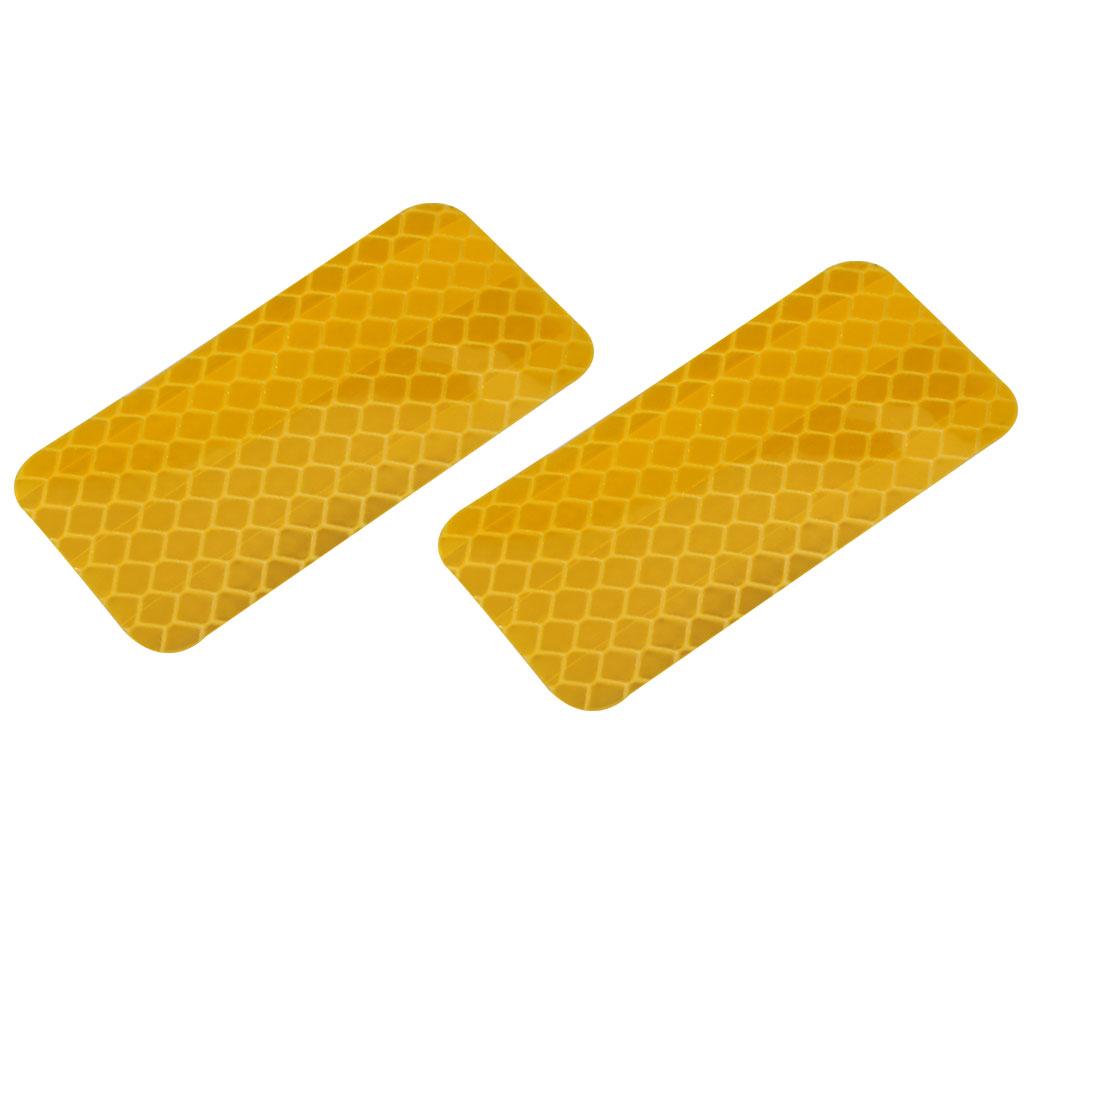 2pcs Honeycomb Reflective Warning Tape Film Sticker Yellow 30mm Width 60mm Long